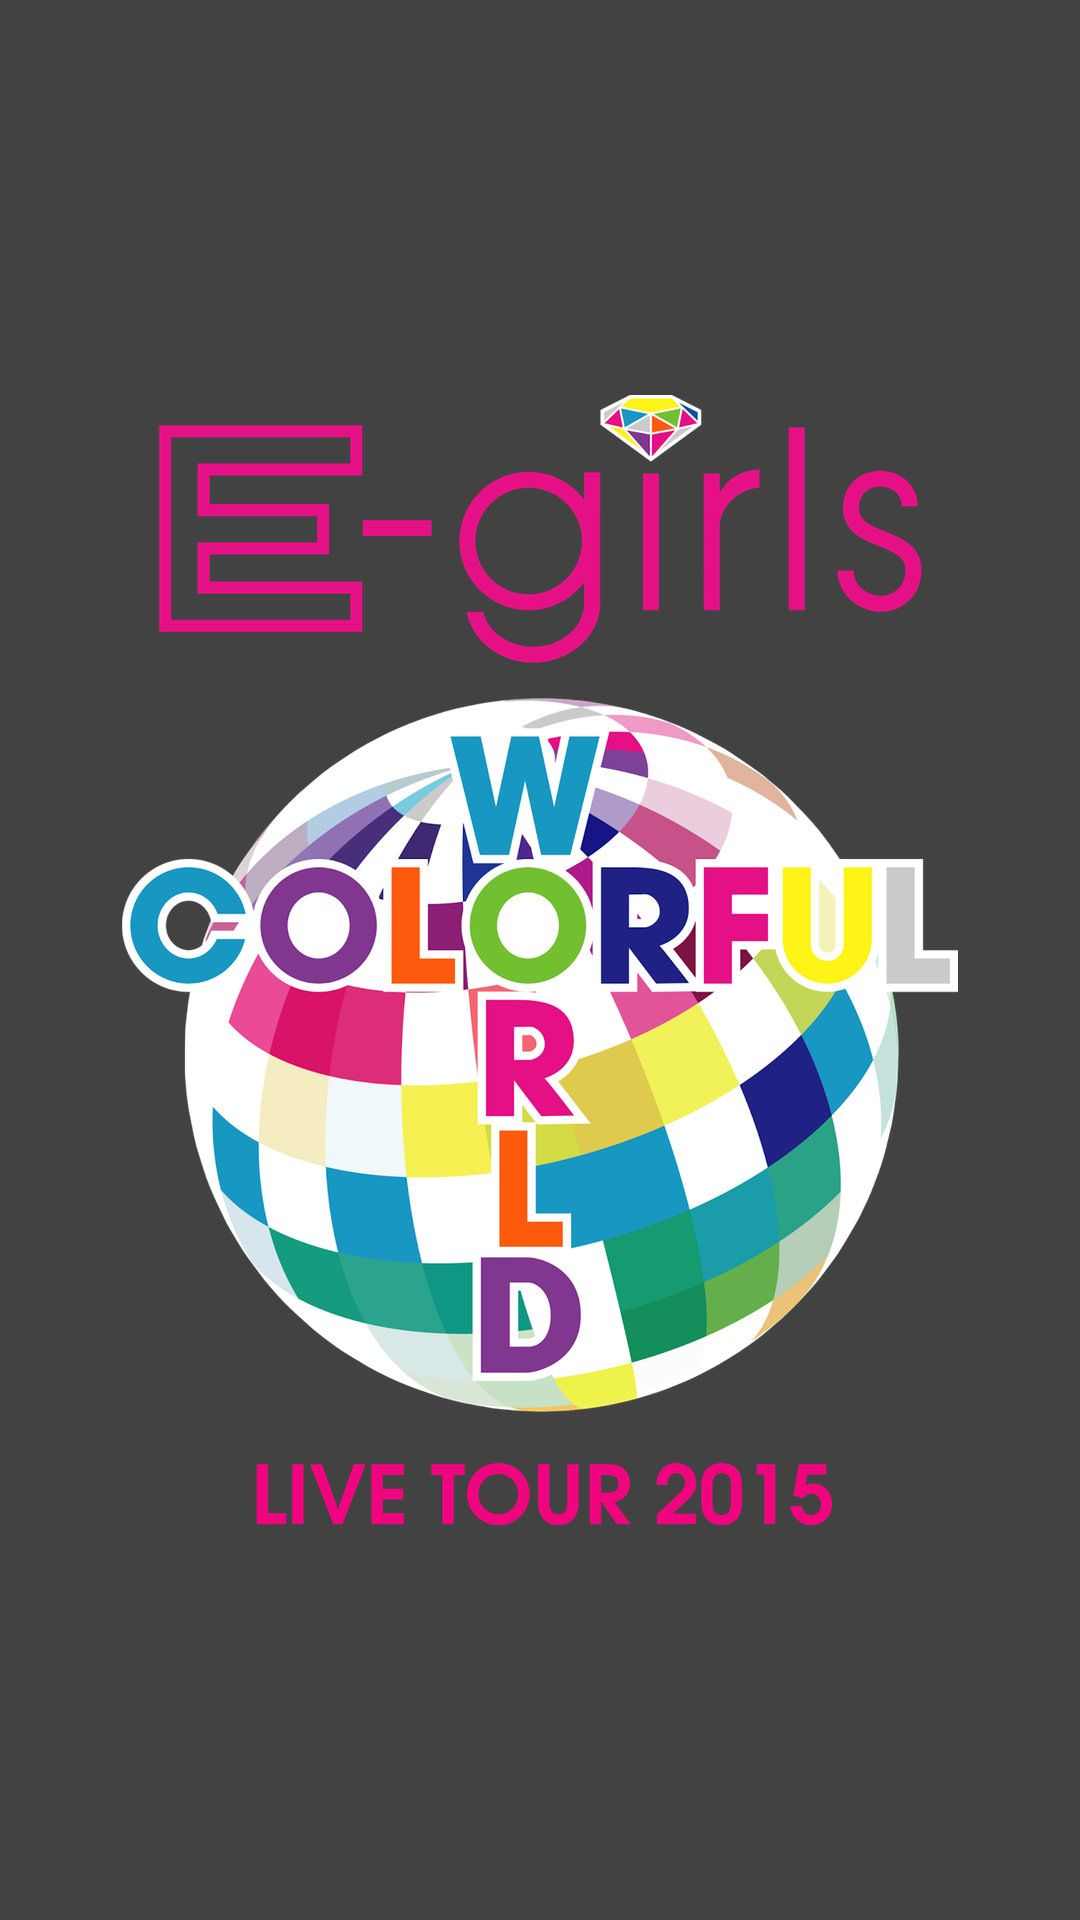 E Girls Live Tour 2015 Iphone壁紙 無料取り放題 高画質 大量